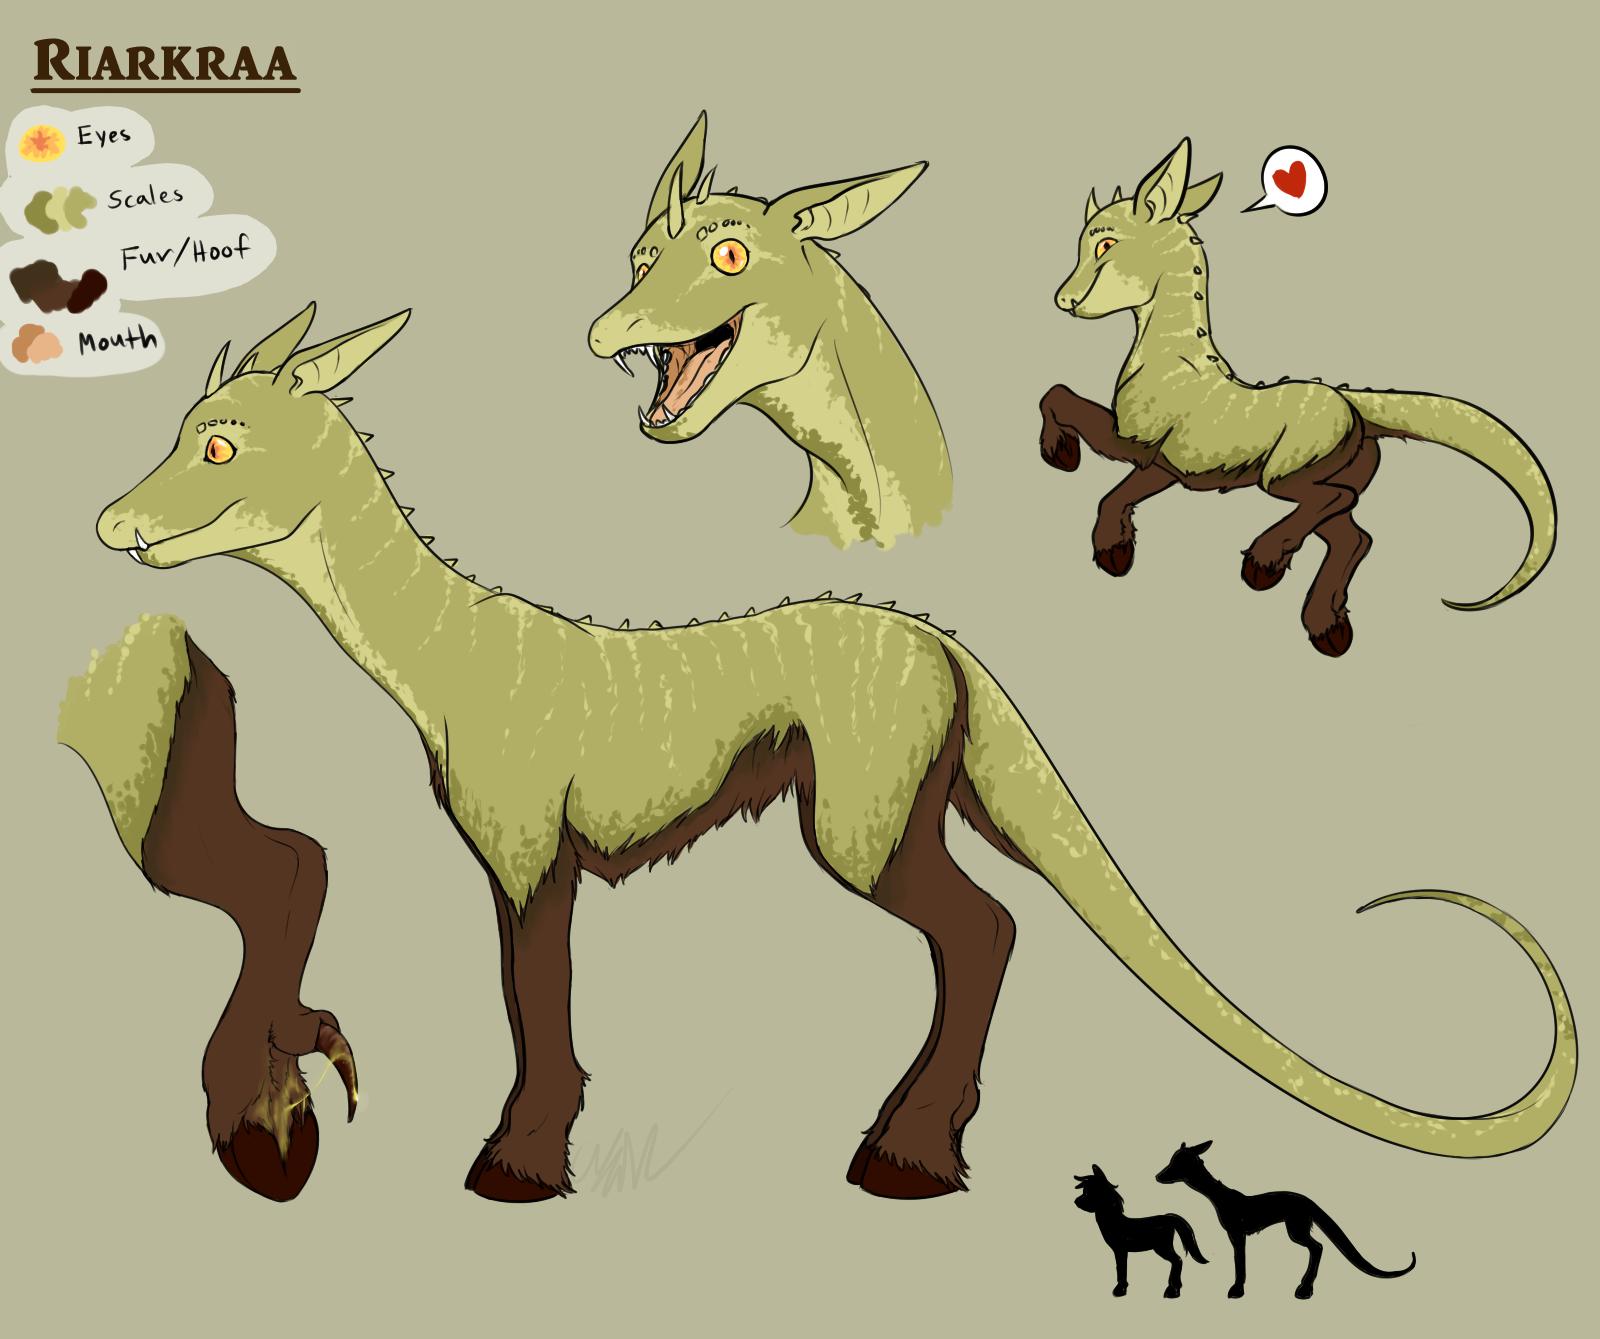 Riarkraa by Mereneth